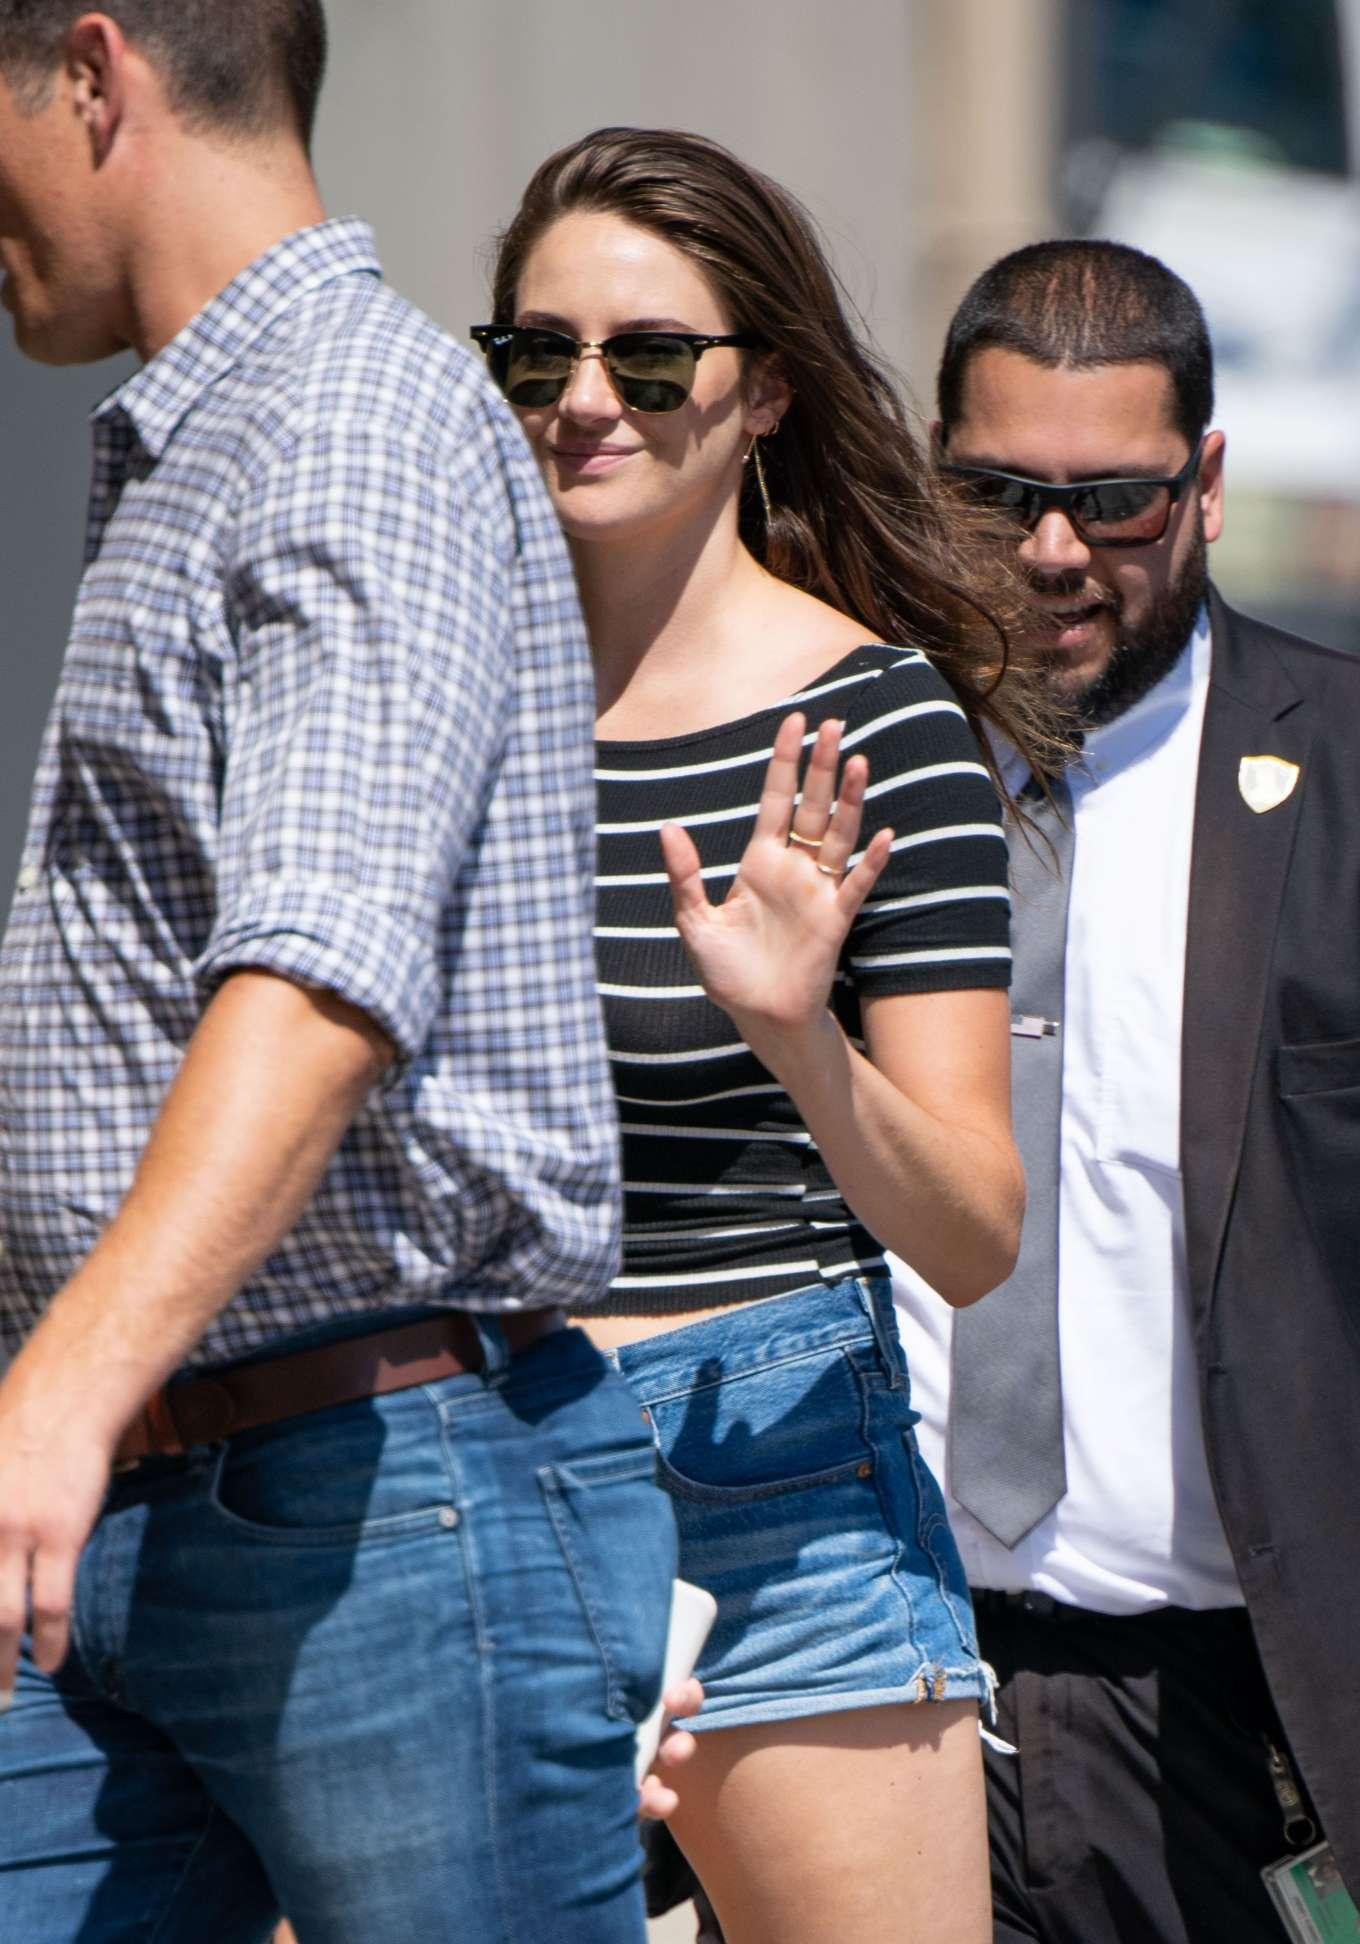 Shailene Woodley - Arriving at Jimmy Kimmel Live! in Hollywood